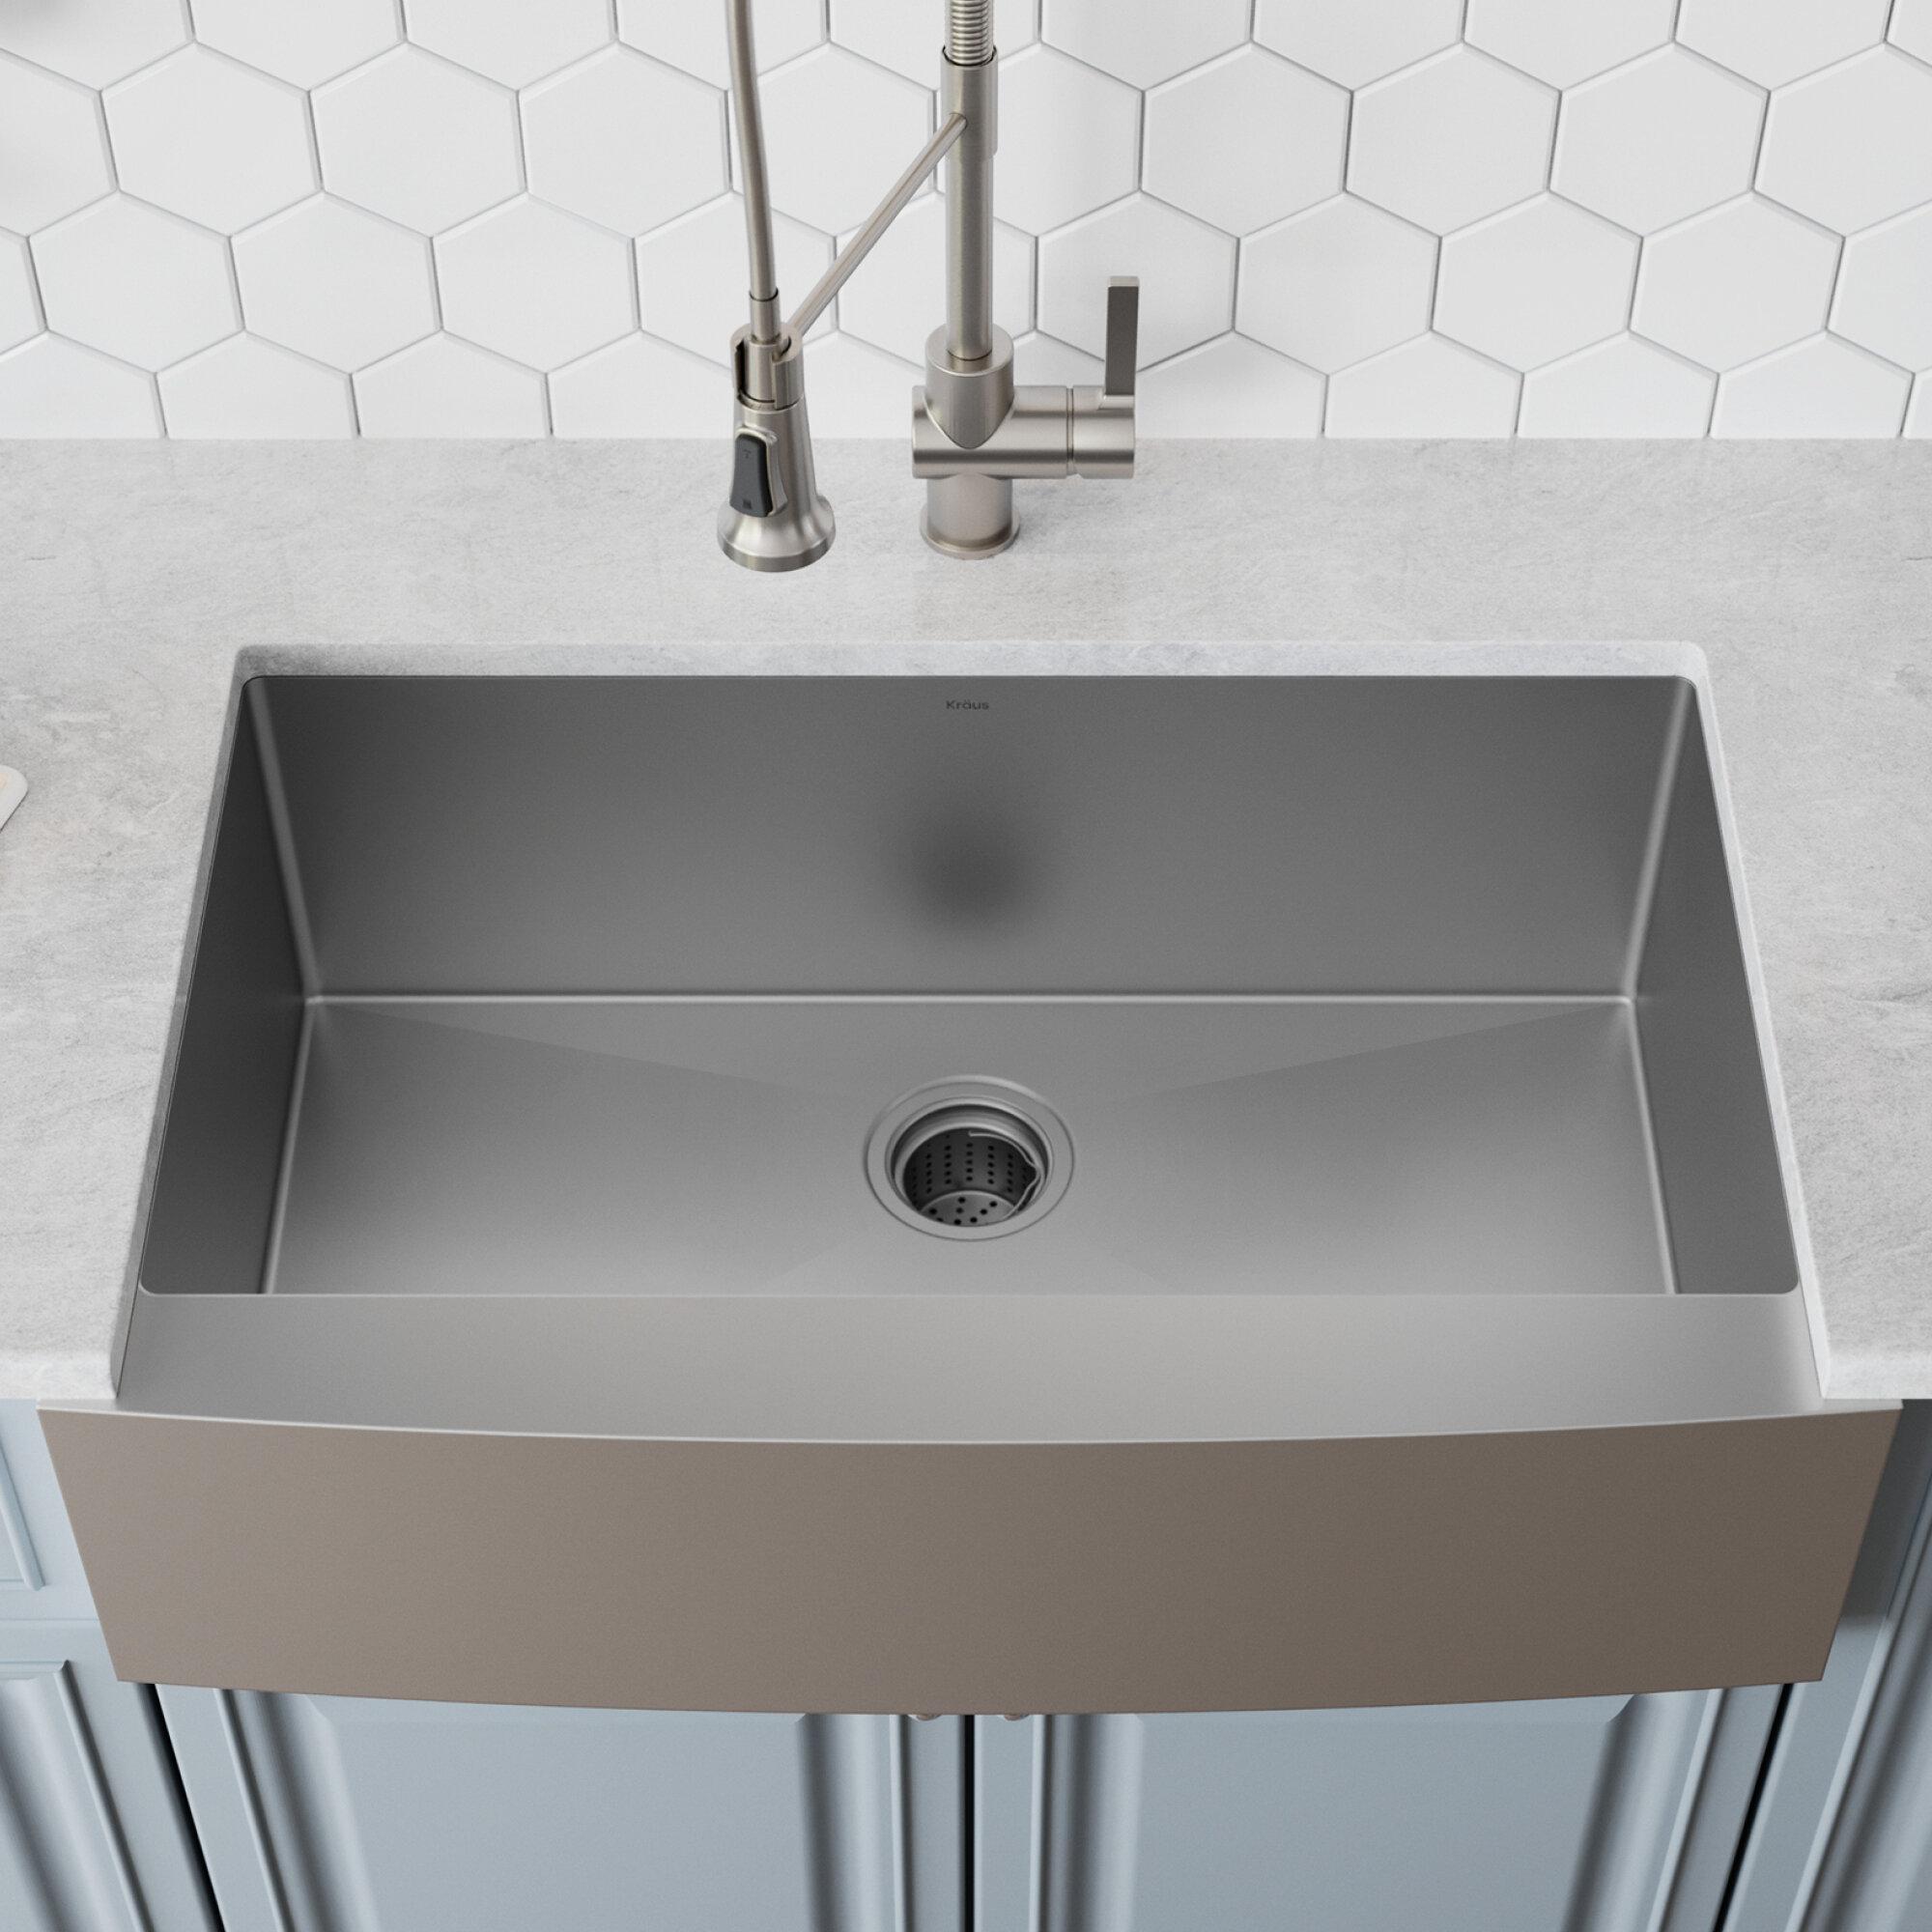 Kraus 33 l x 21 w farmhouse kitchen sink with drain assembly reviews wayfair